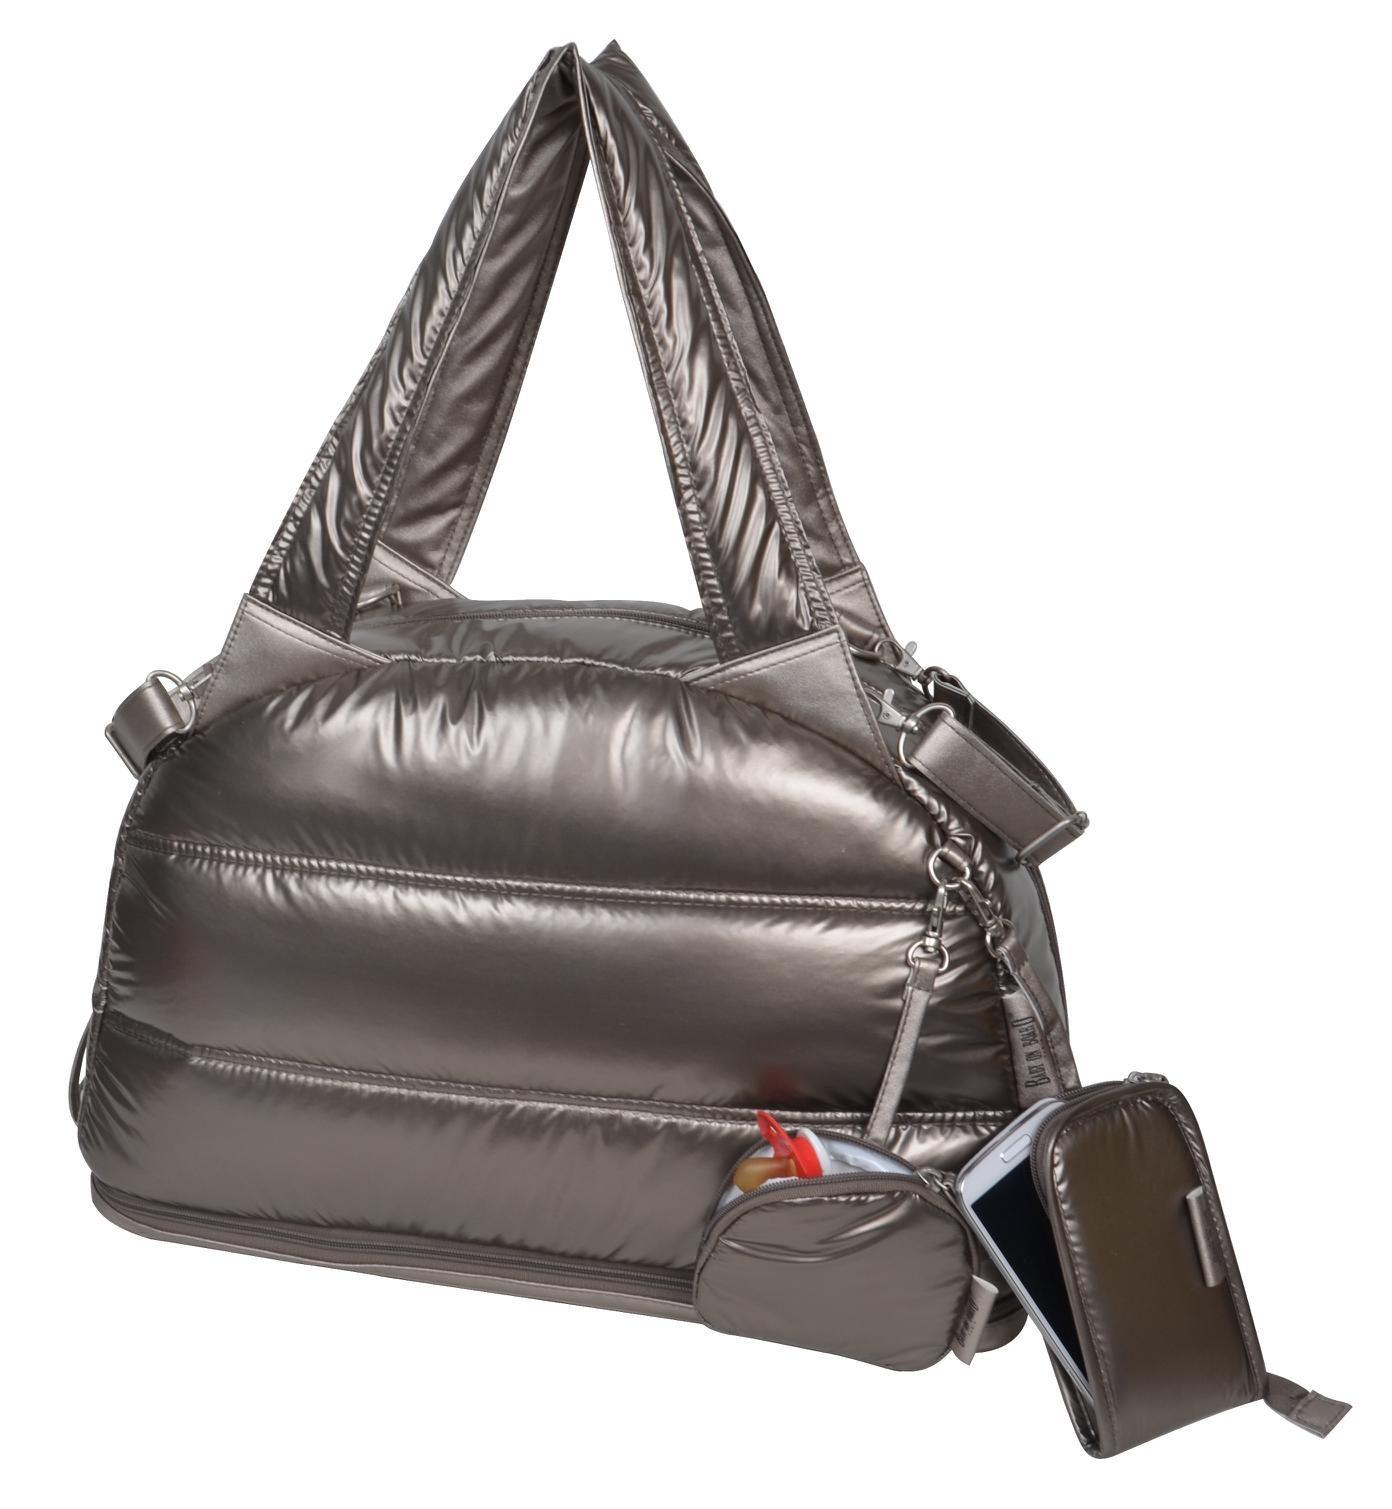 Sac à langer Mon Doudoune Bag